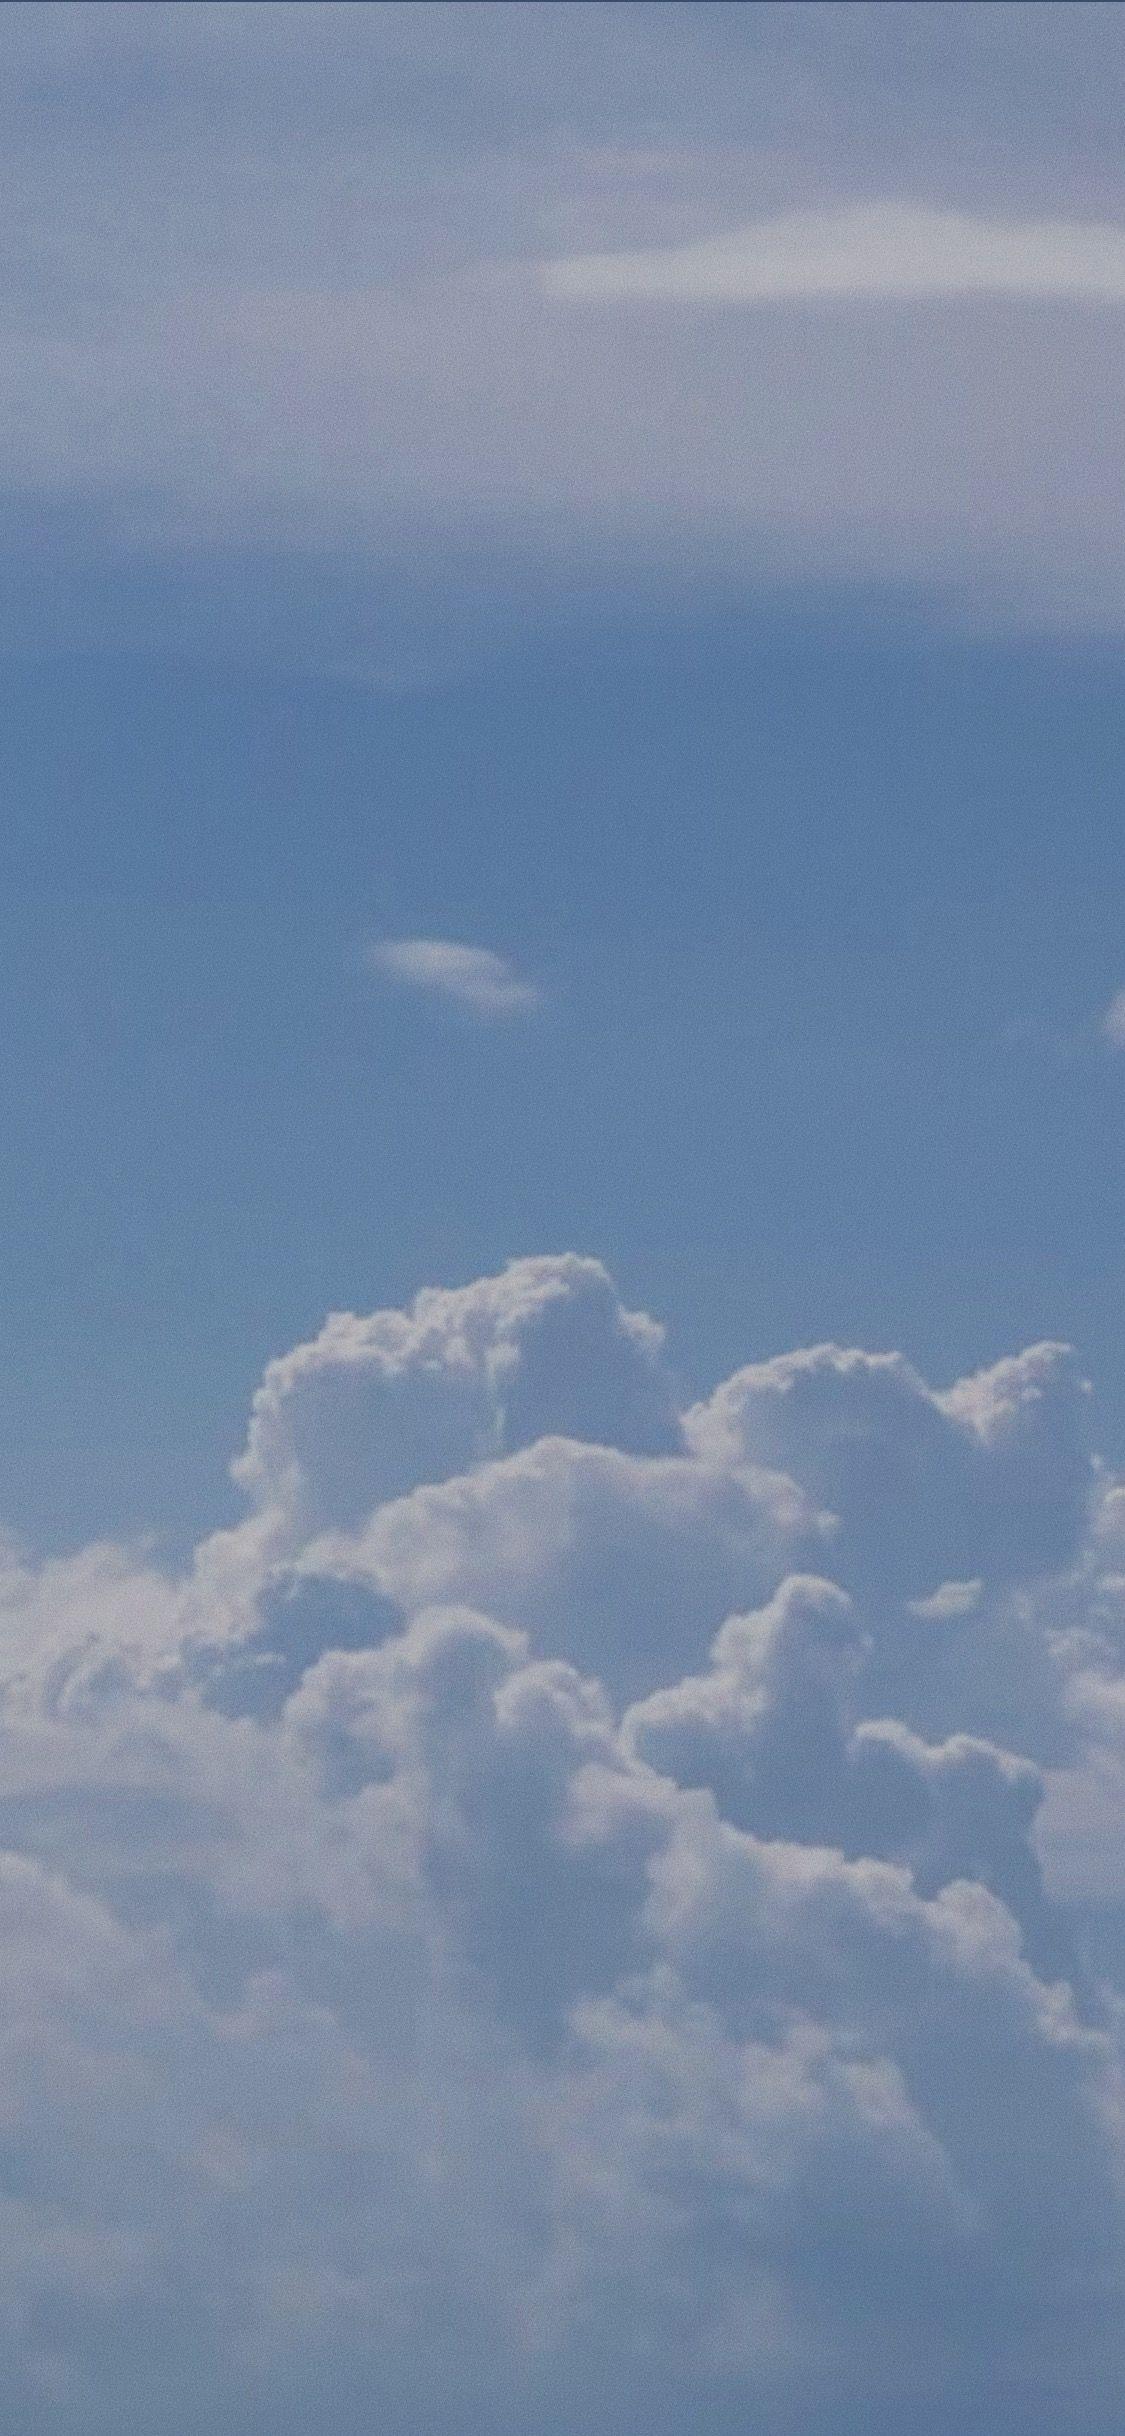 Clouds Aesthetic Pastel Blue Summer Vibes Ocean Cloud Cloudy Di 2020 Wallpaper Ponsel